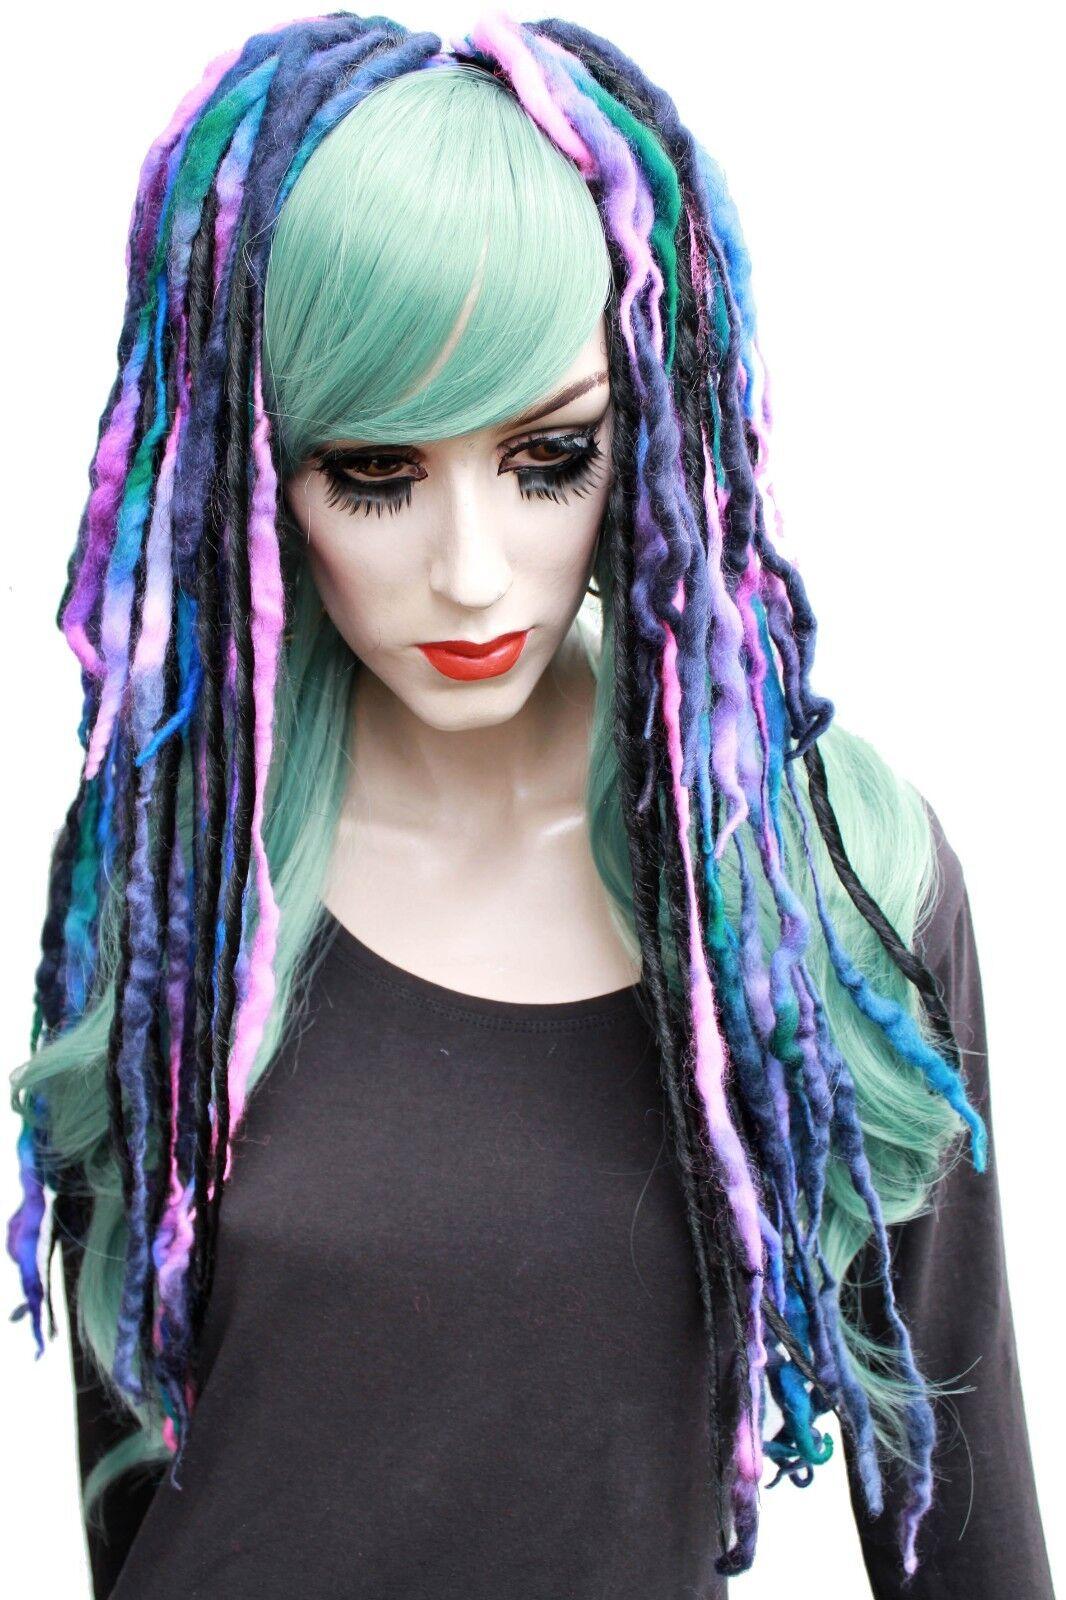 Wool Dread Hair Falls Purple Black Hair Extensions Gothic Indie